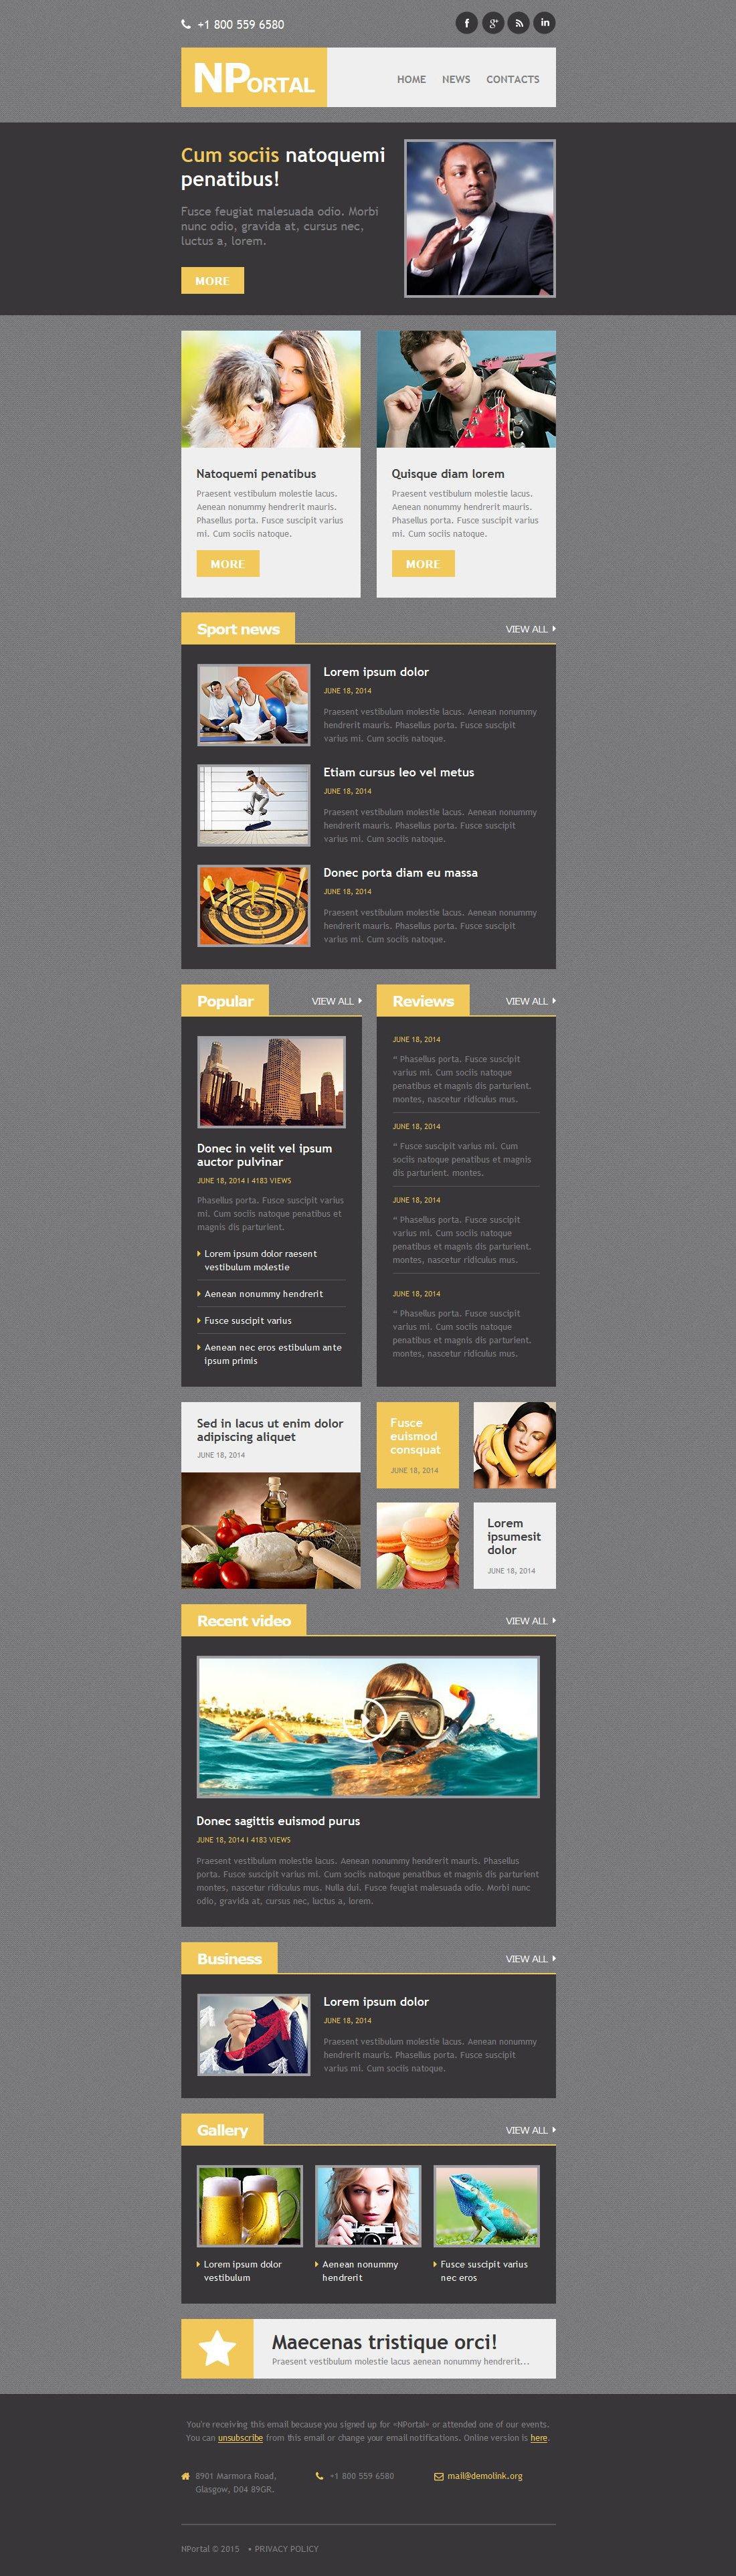 News Portal Responsive Newsletter Template